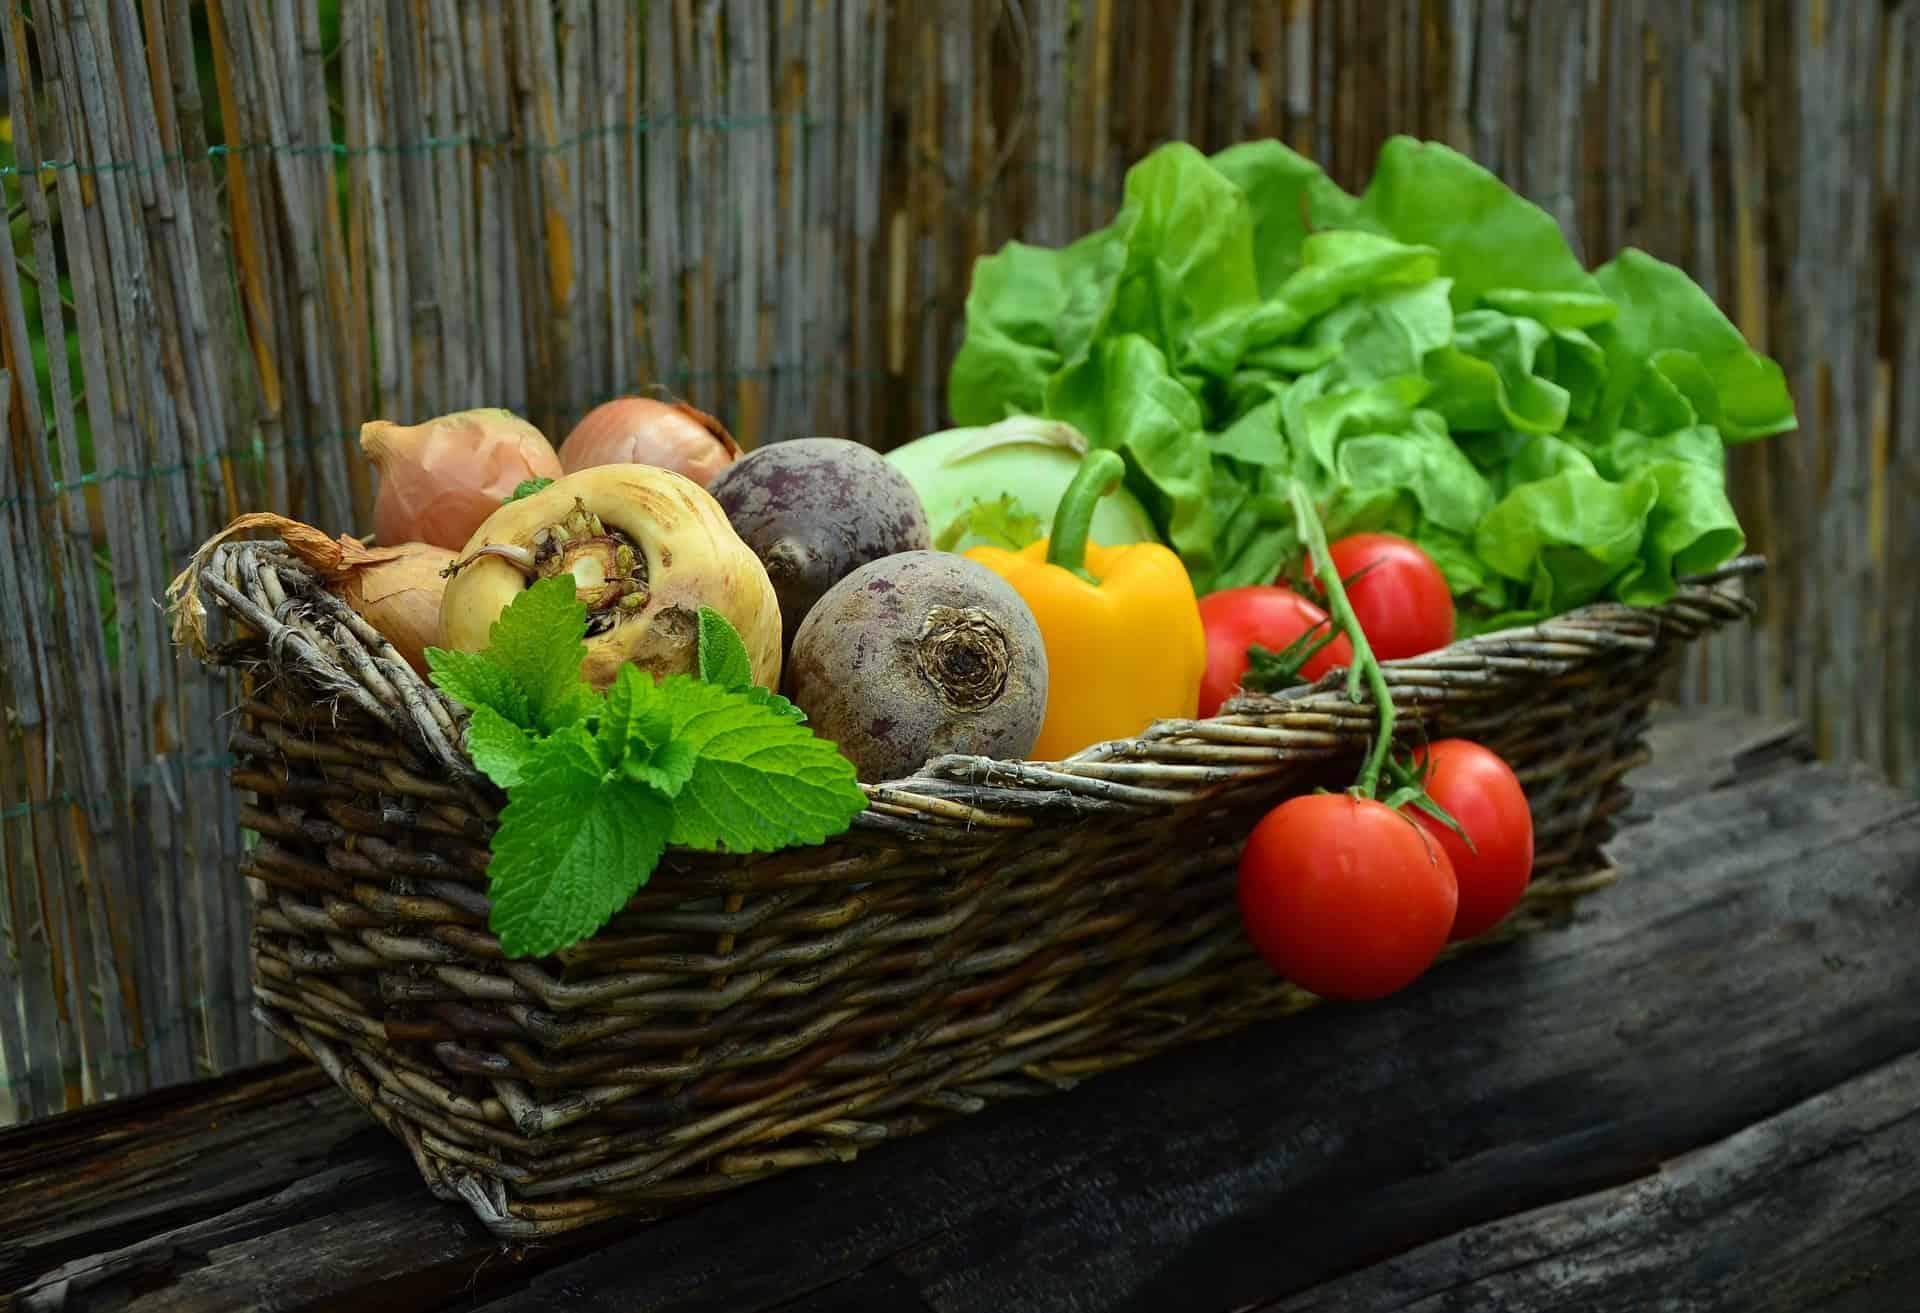 Antioxidantien in Lebensmitteln: Freien Radikalen den Kampf ansagen